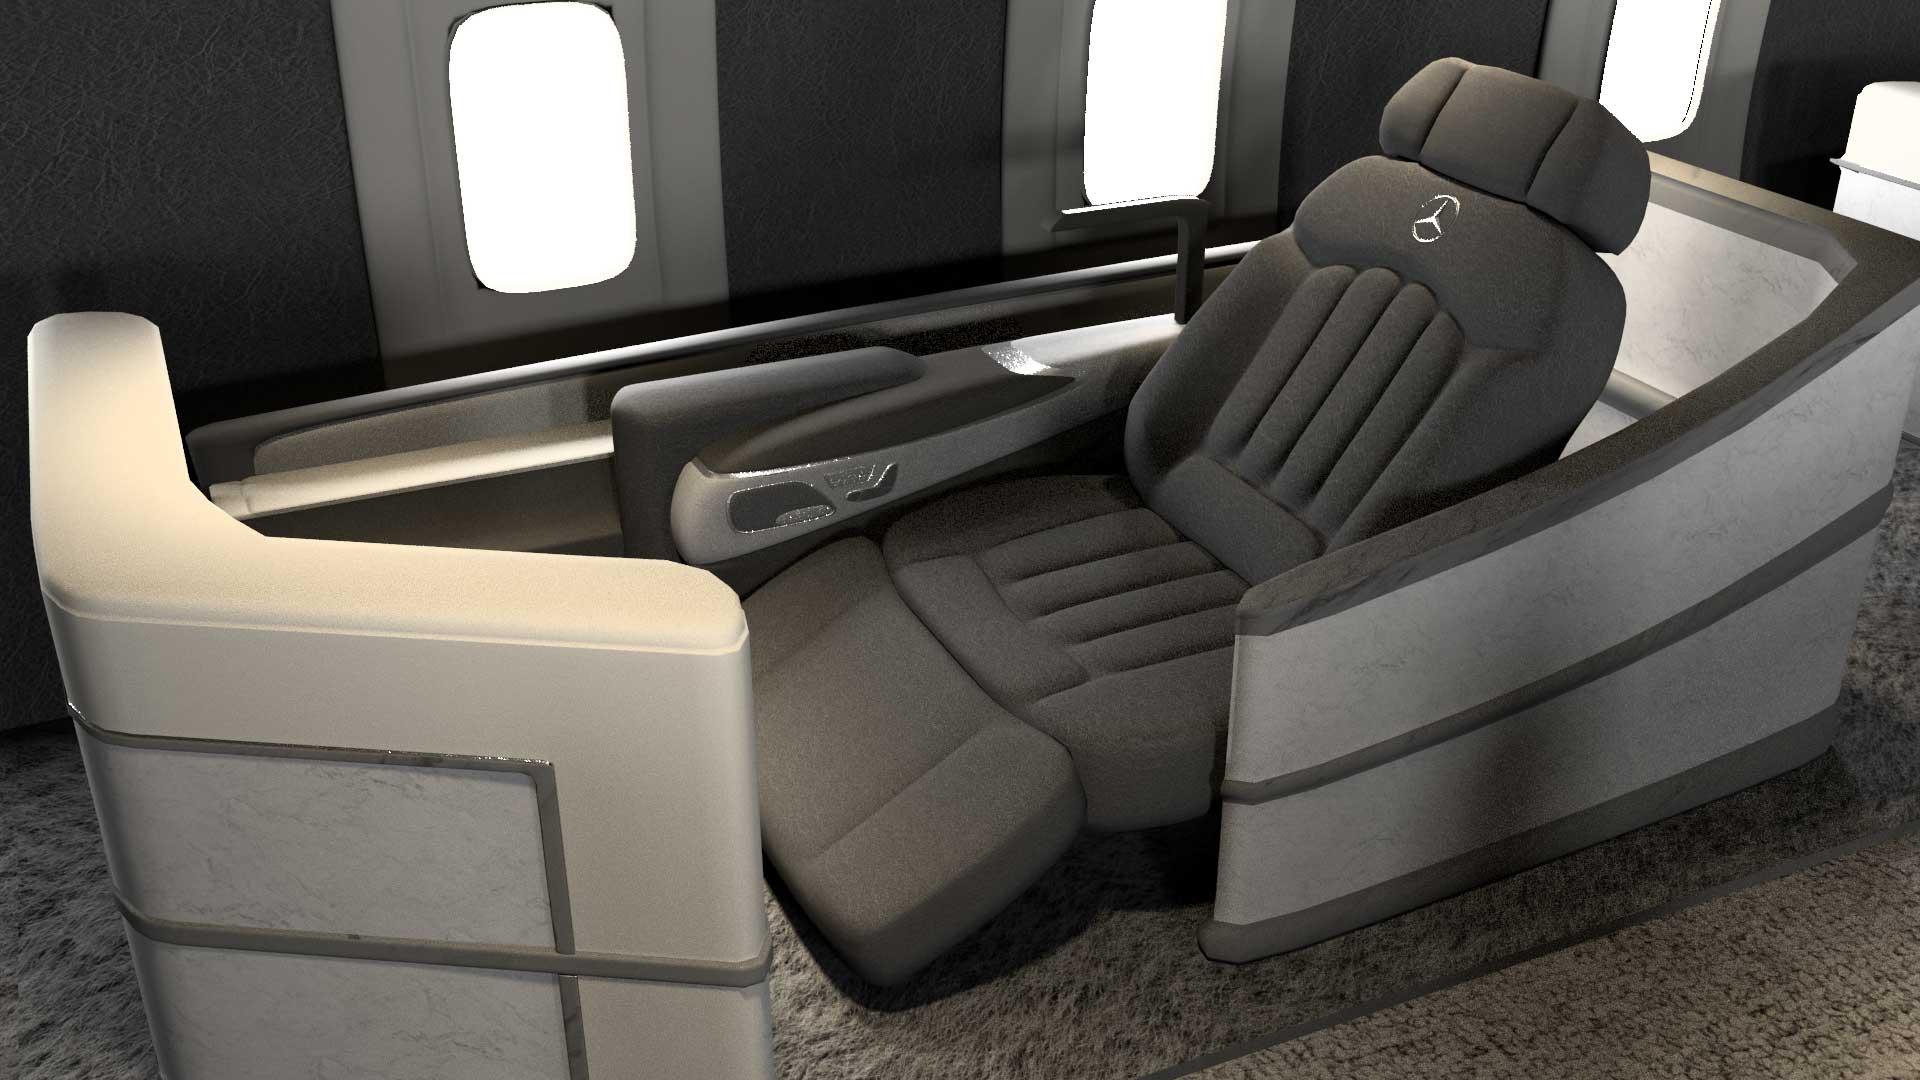 Thumbnail for Benz S-Klasse